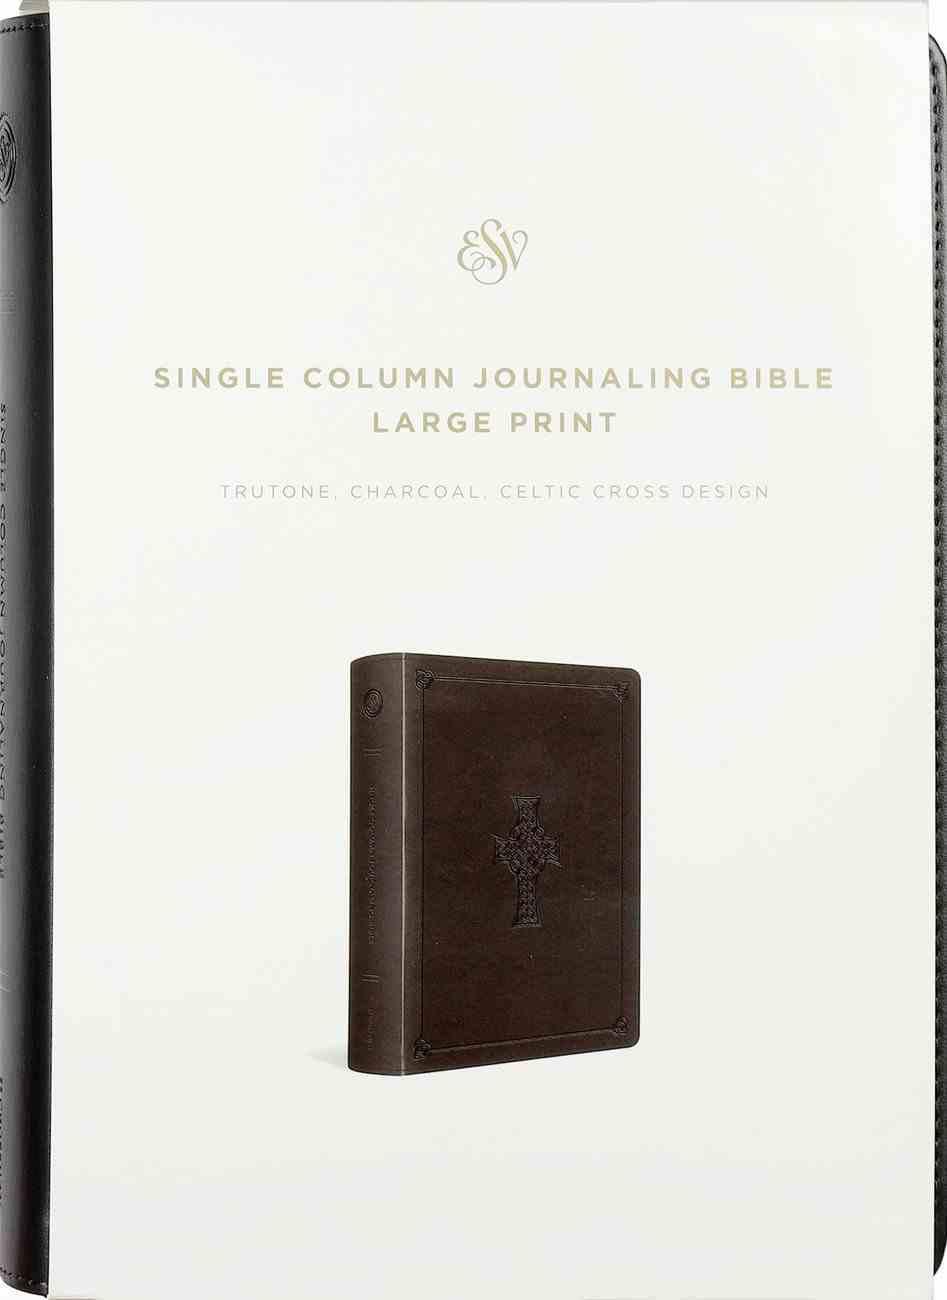 ESV Single Column Journaling Bible Large Print Charcoal Celtic Cross Design (Black Letter Edition) Imitation Leather